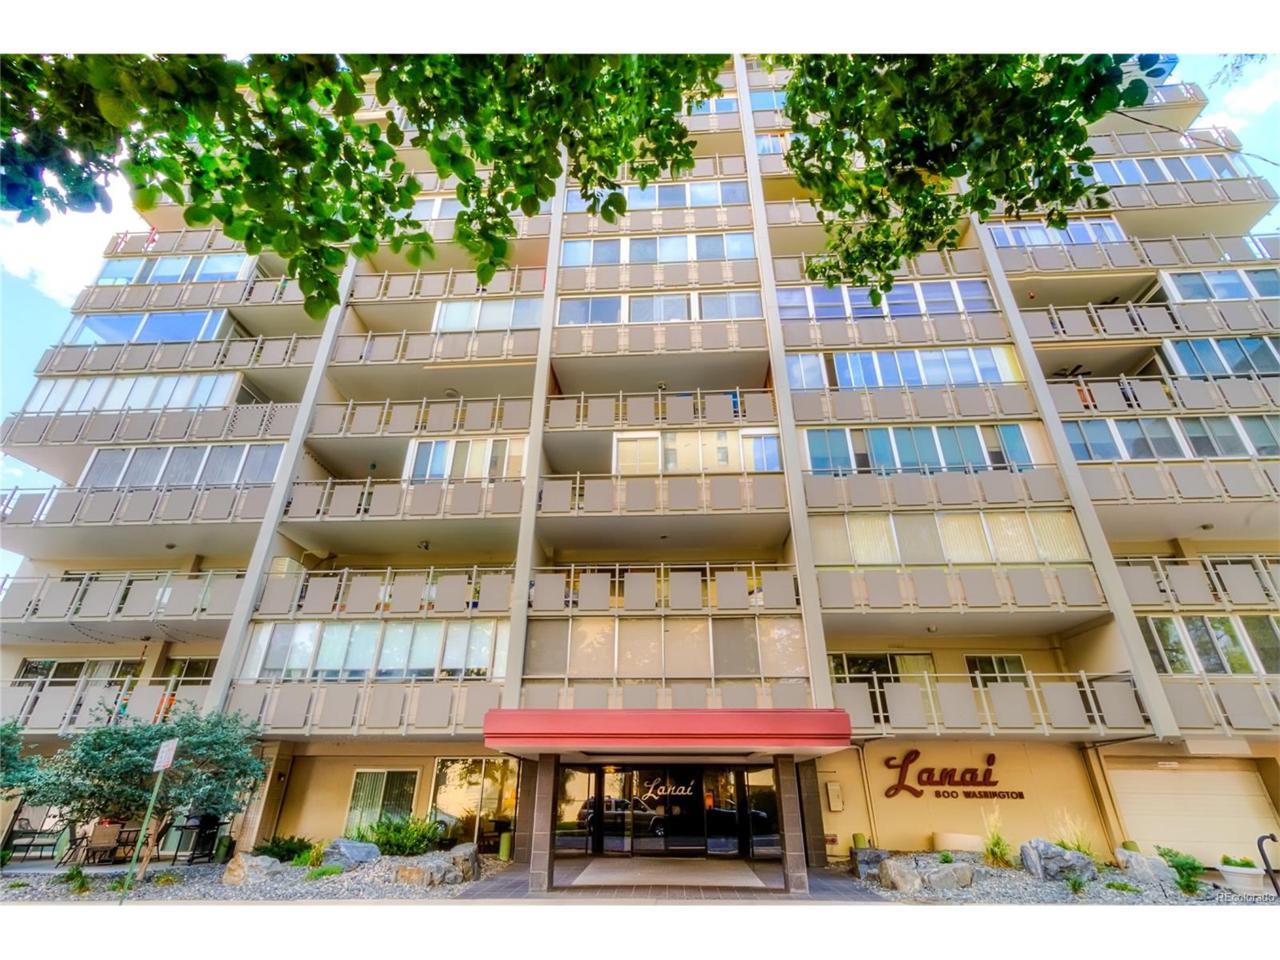 800 Washington Street #1105, Denver, CO 80203 (MLS #9459602) :: 8z Real Estate